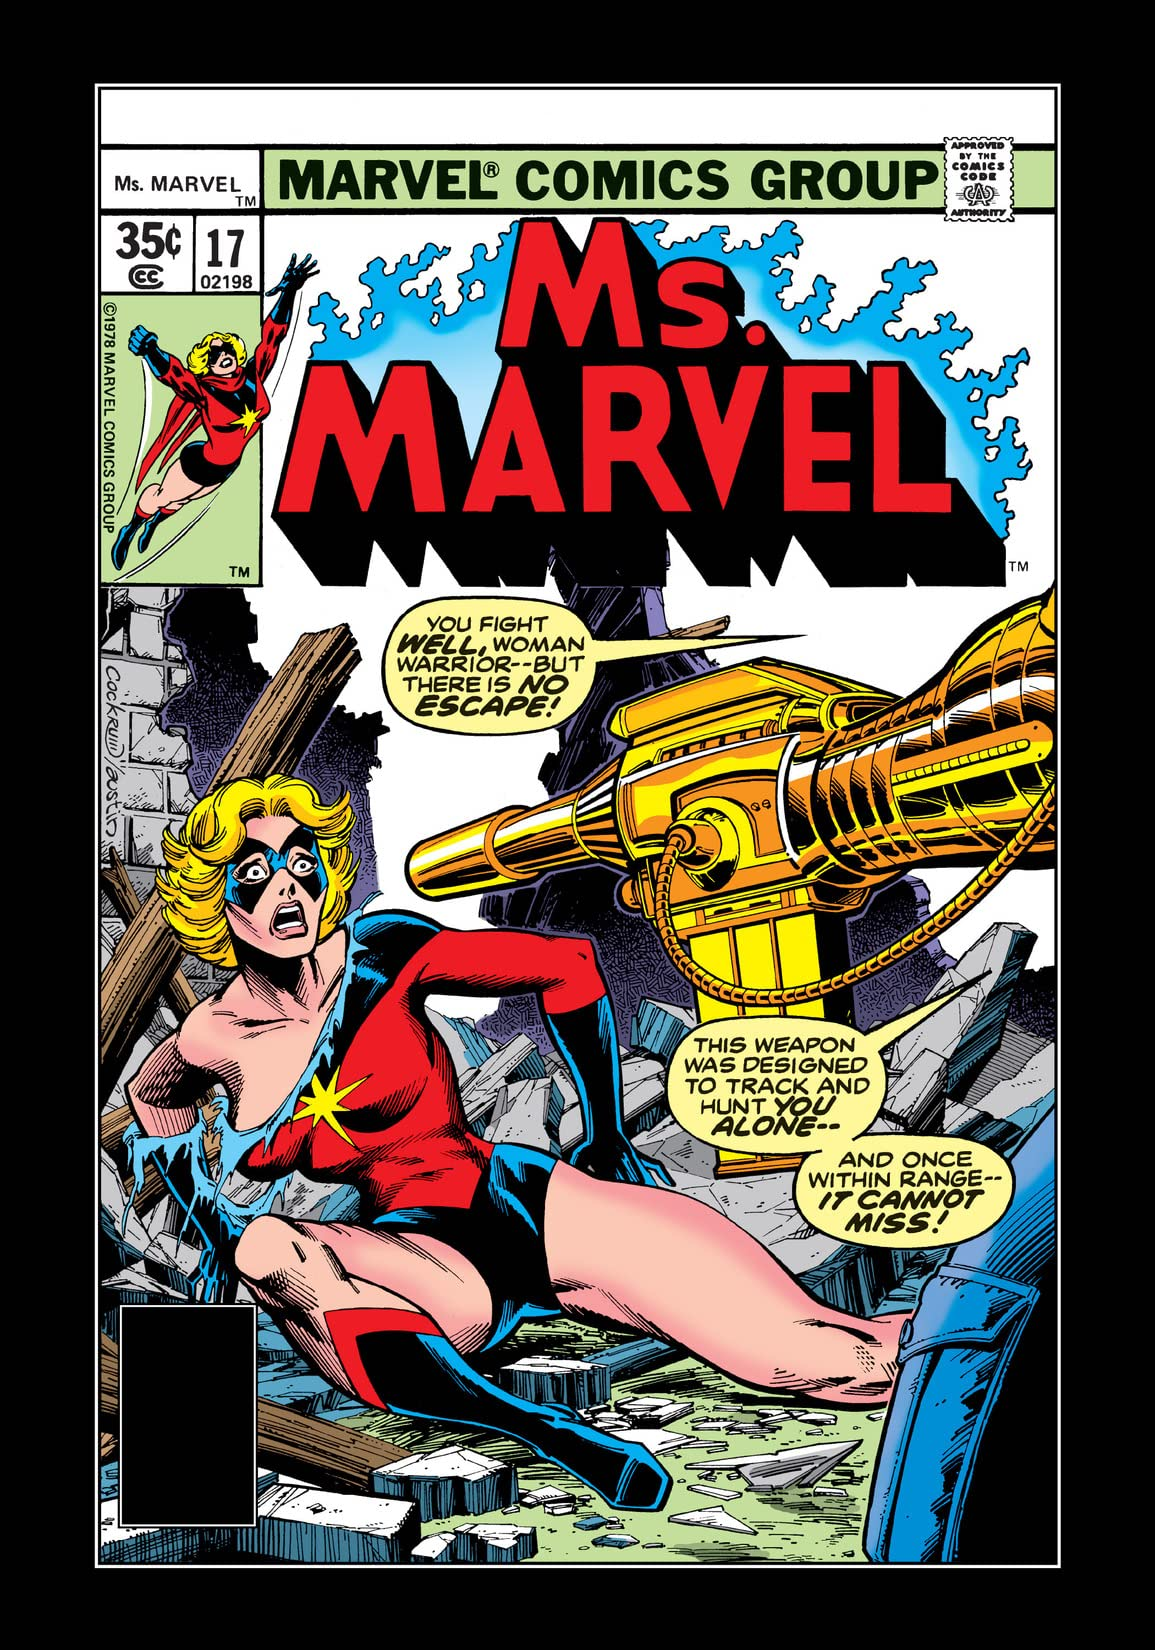 Ms. Marvel (1977-1979) #17